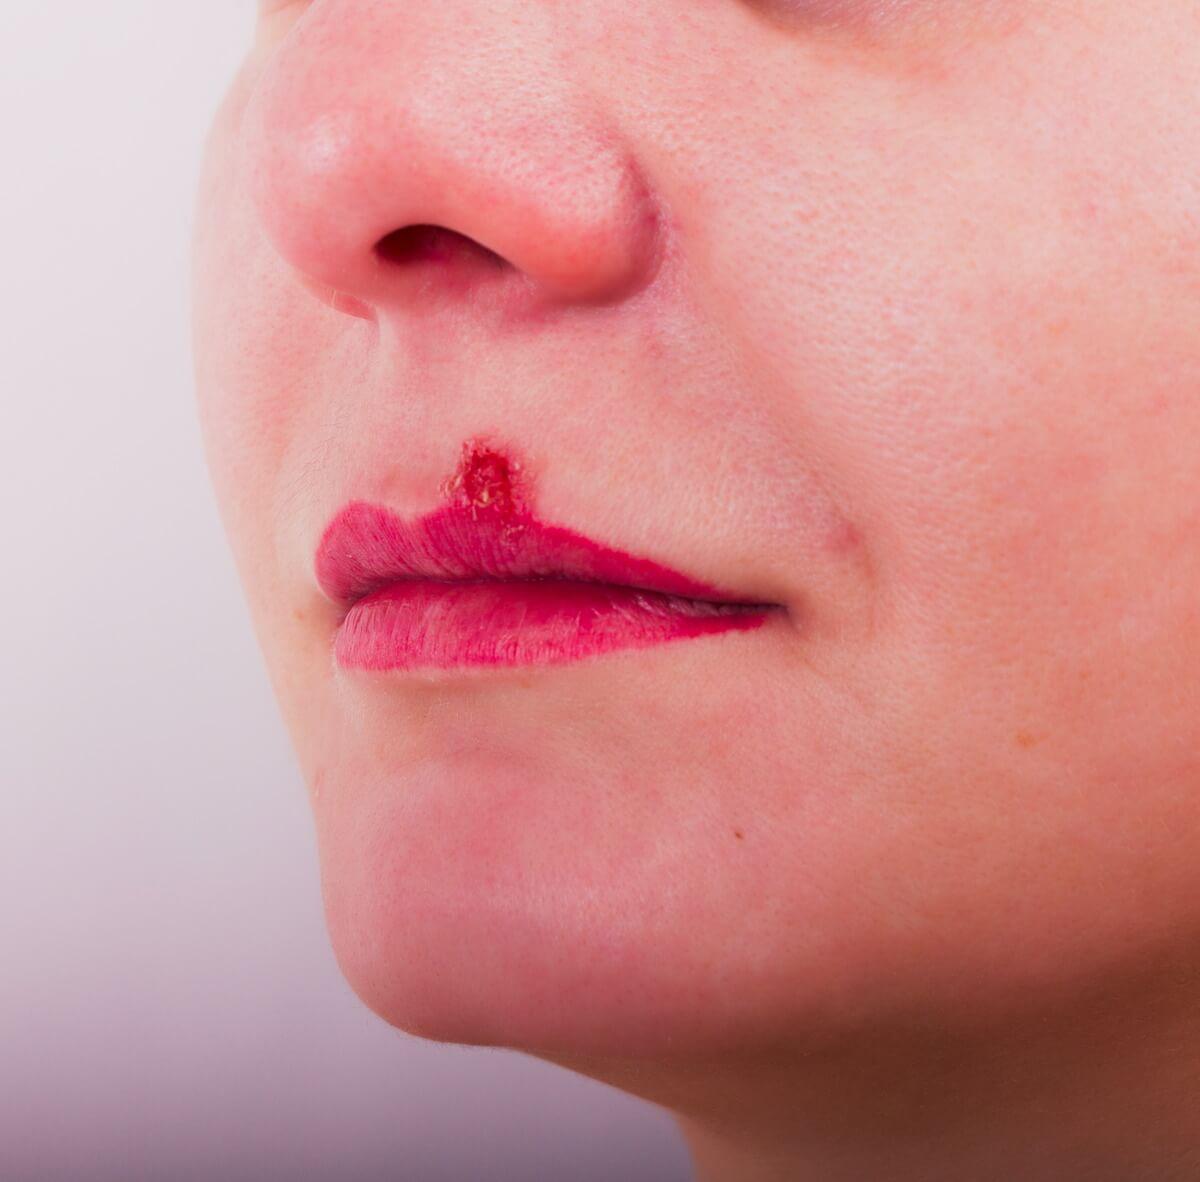 Herpes Simplex Ausbruch an der Lippe (Lippenherpes)